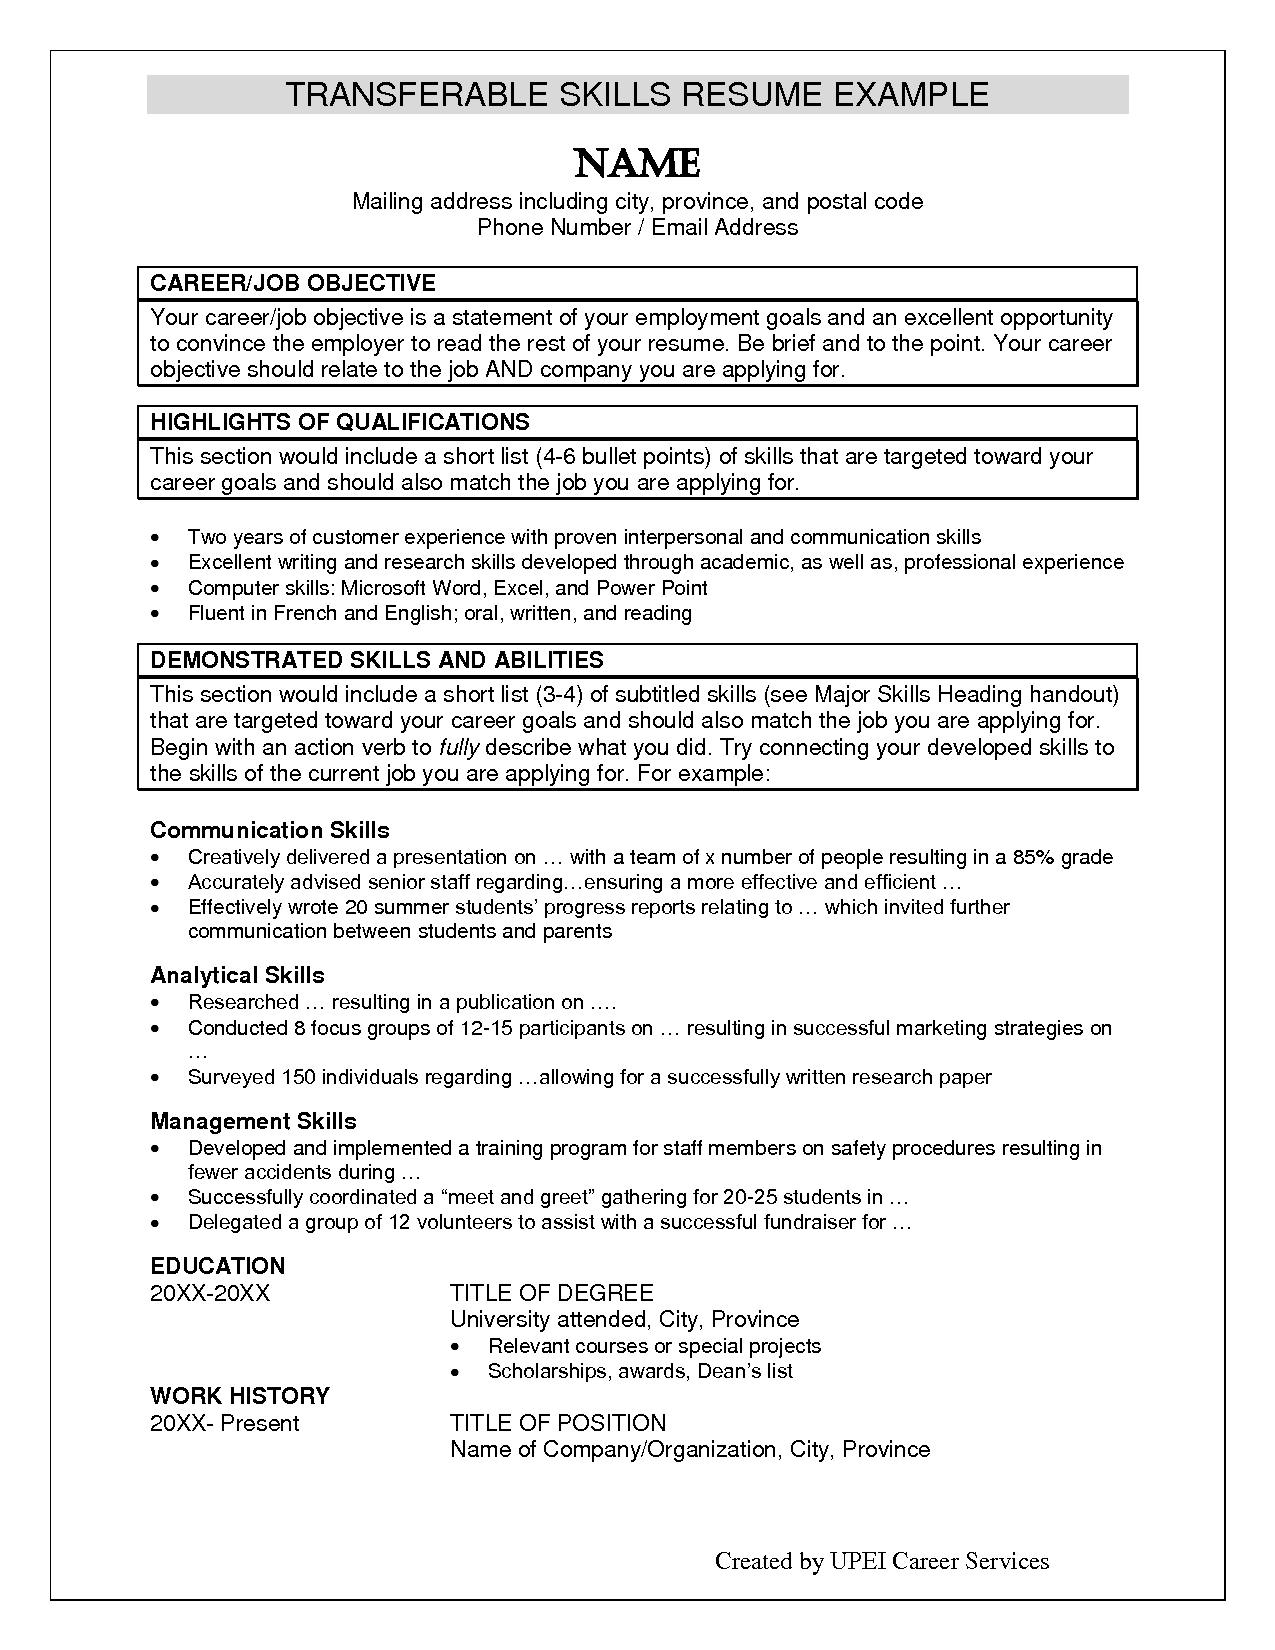 Transferable Skills Resume Example Resume Skills Resume Skills Section Resume Examples